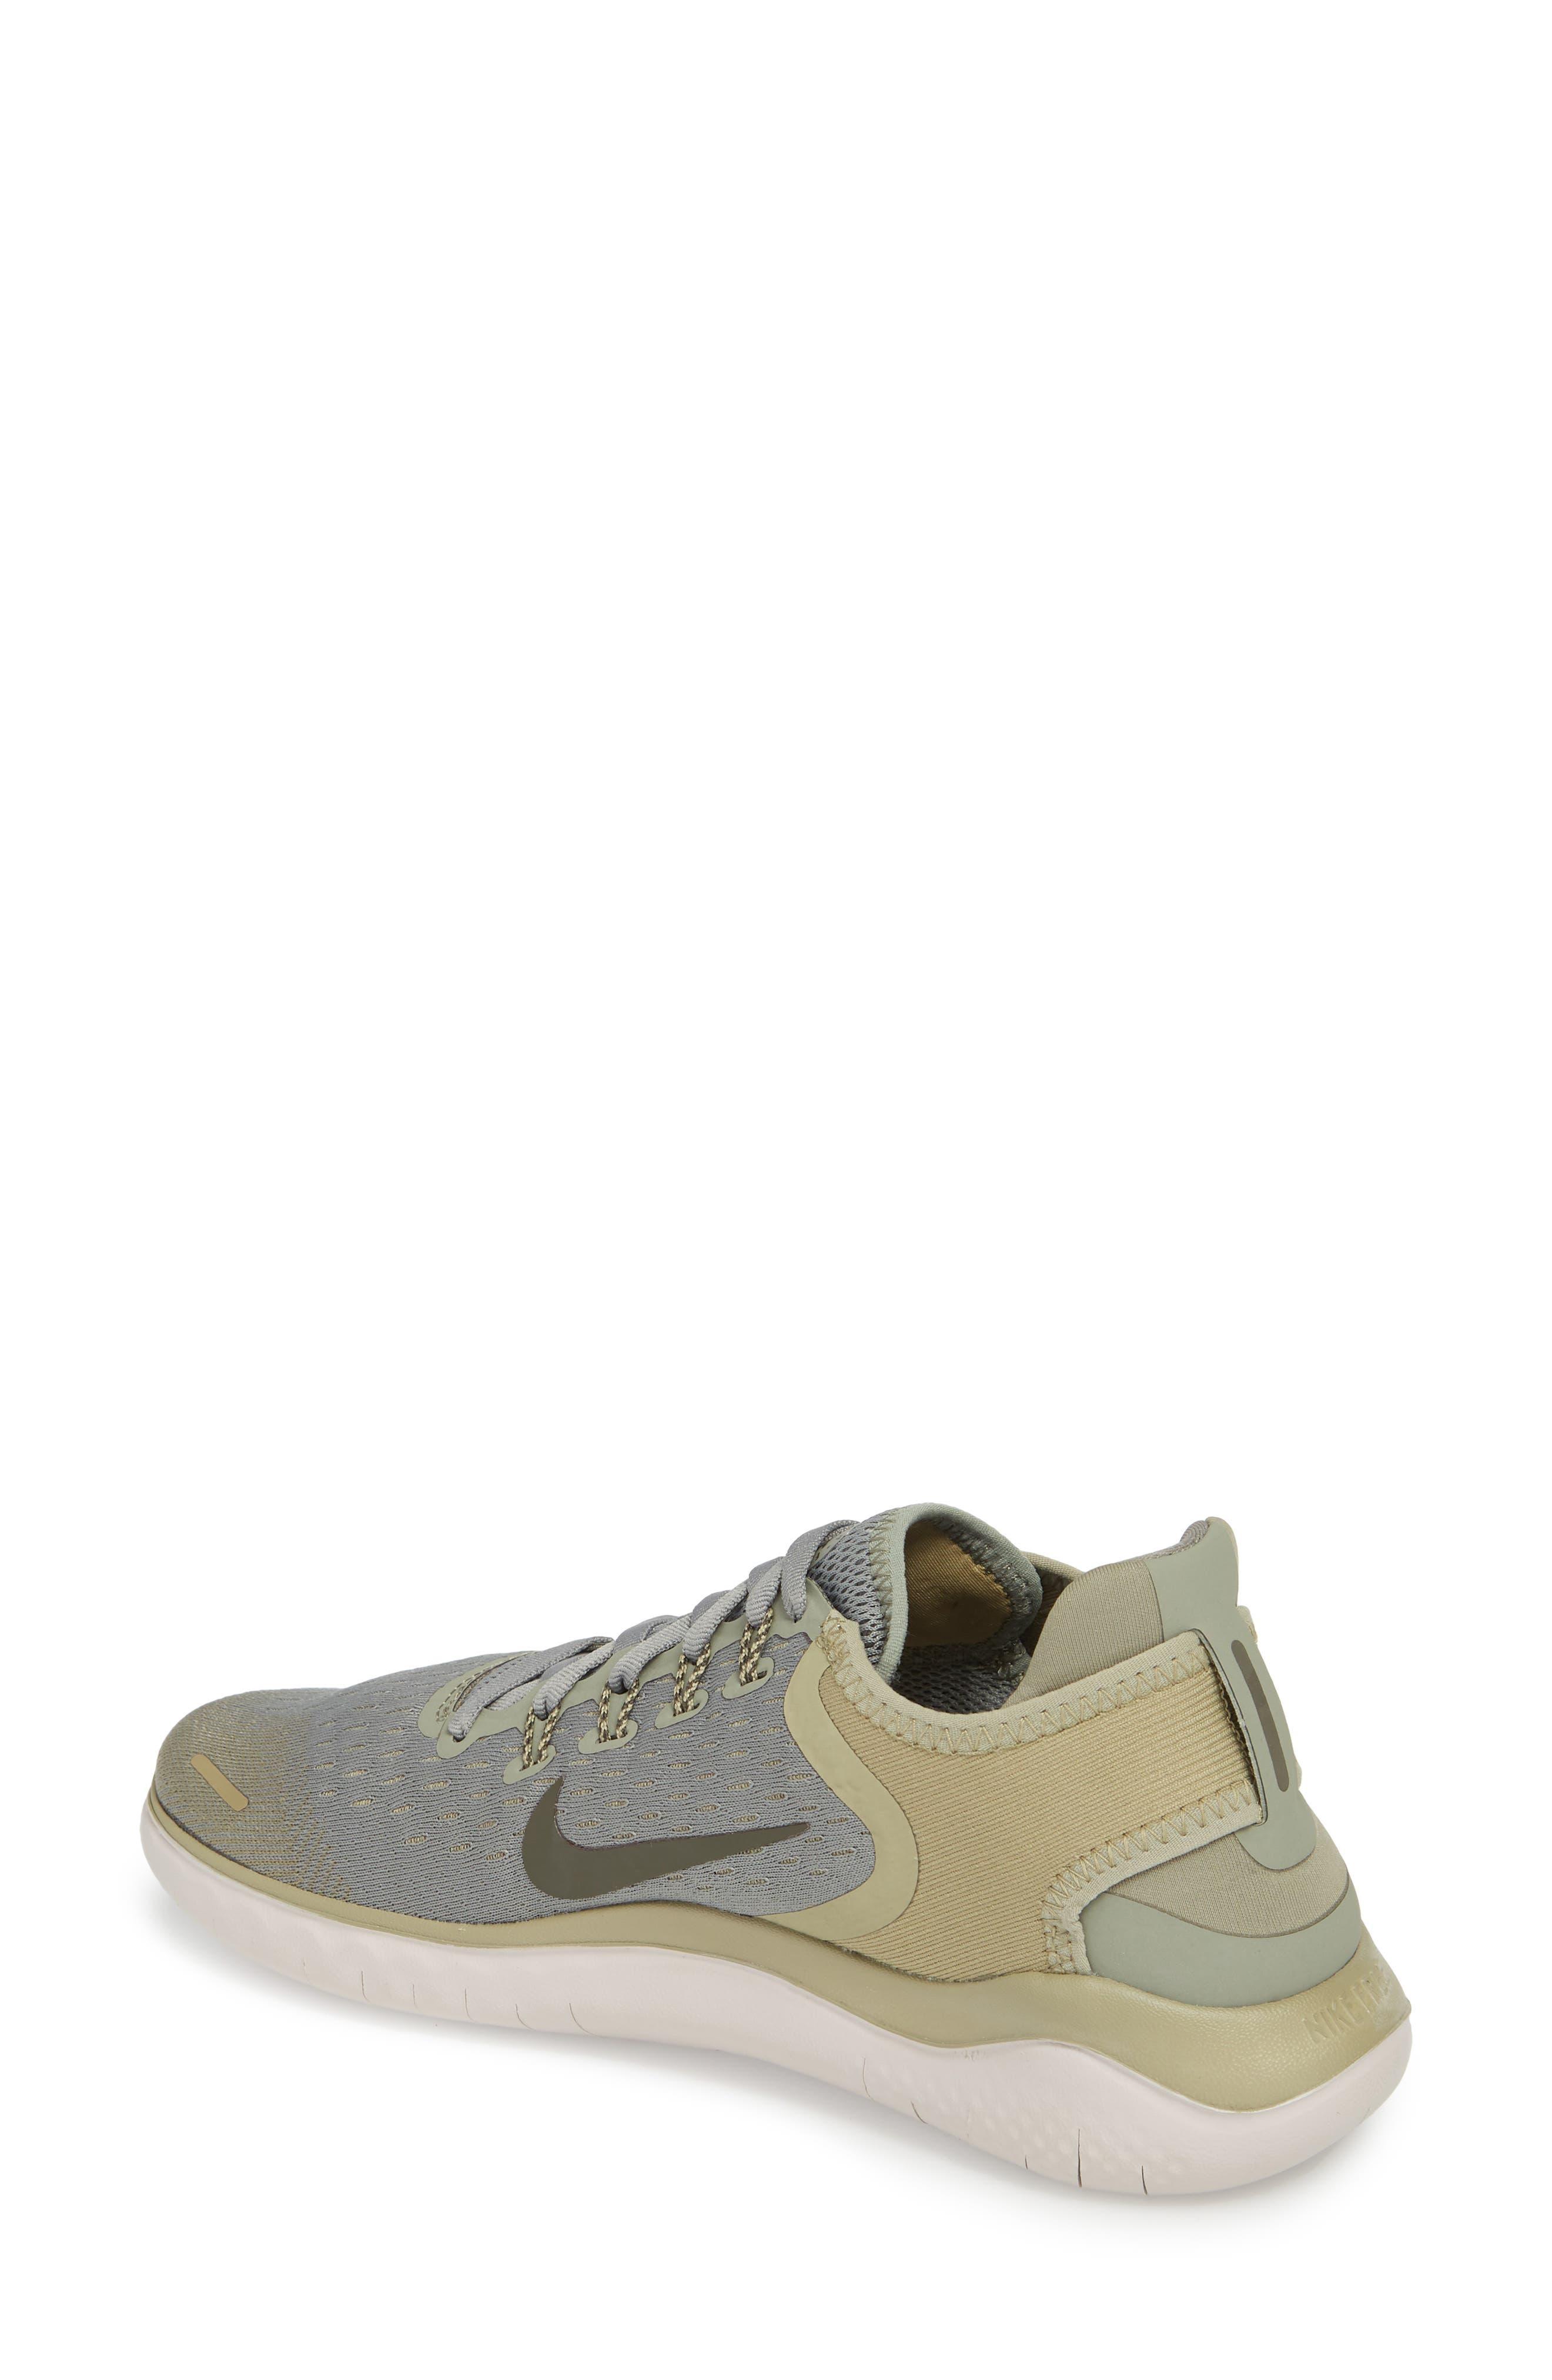 Free RN 2018 Running Shoe,                             Alternate thumbnail 2, color,                             Dark Stucco/ Cargo Khaki